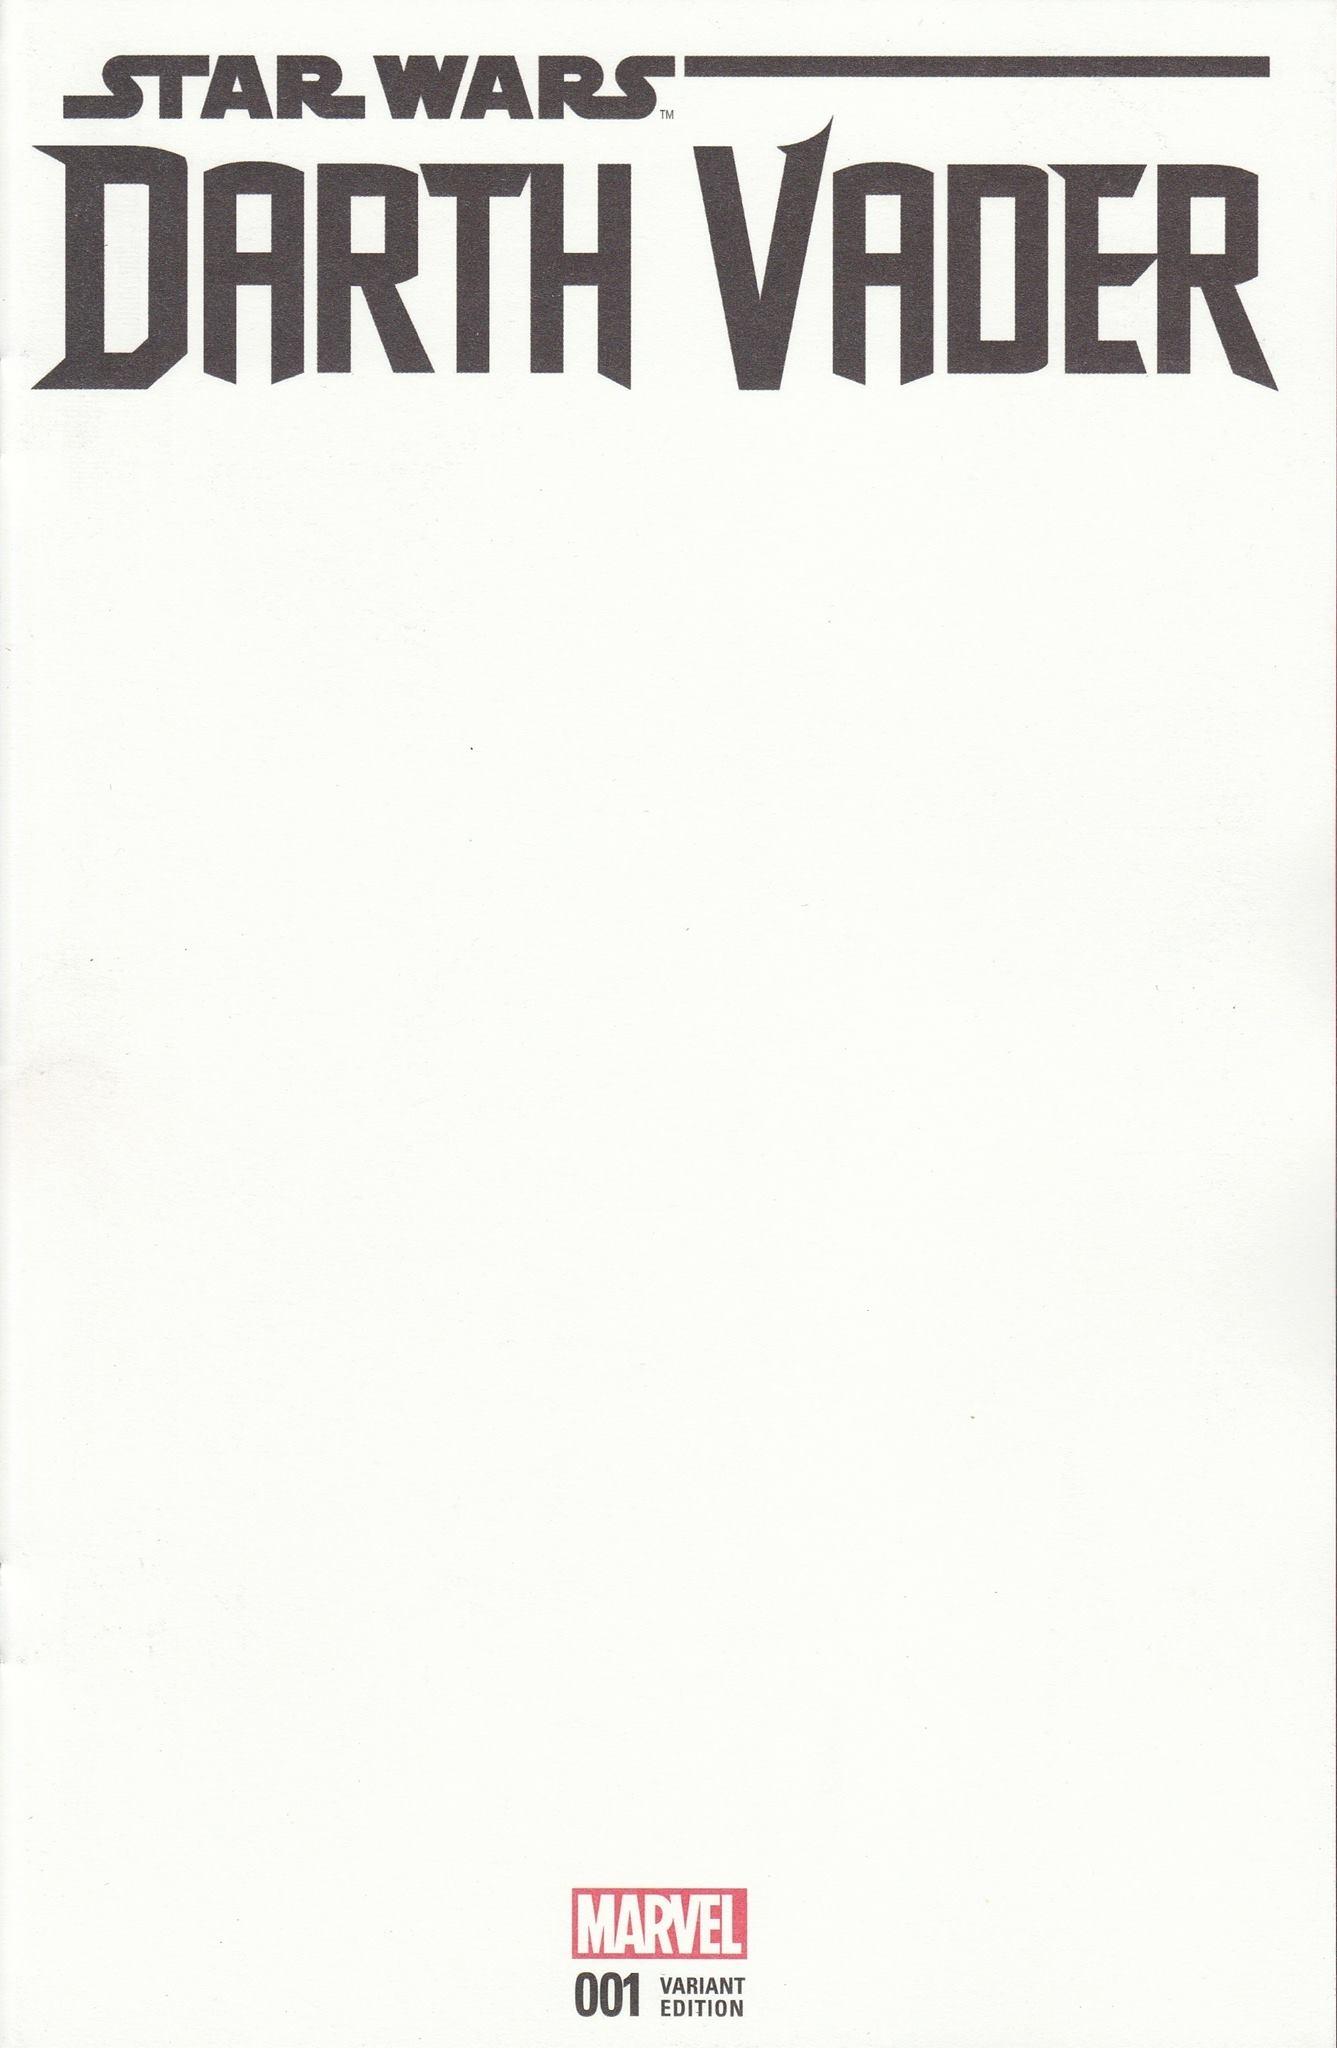 Darth Vader #1 (Blank Variant Cover) (07.06.2017)